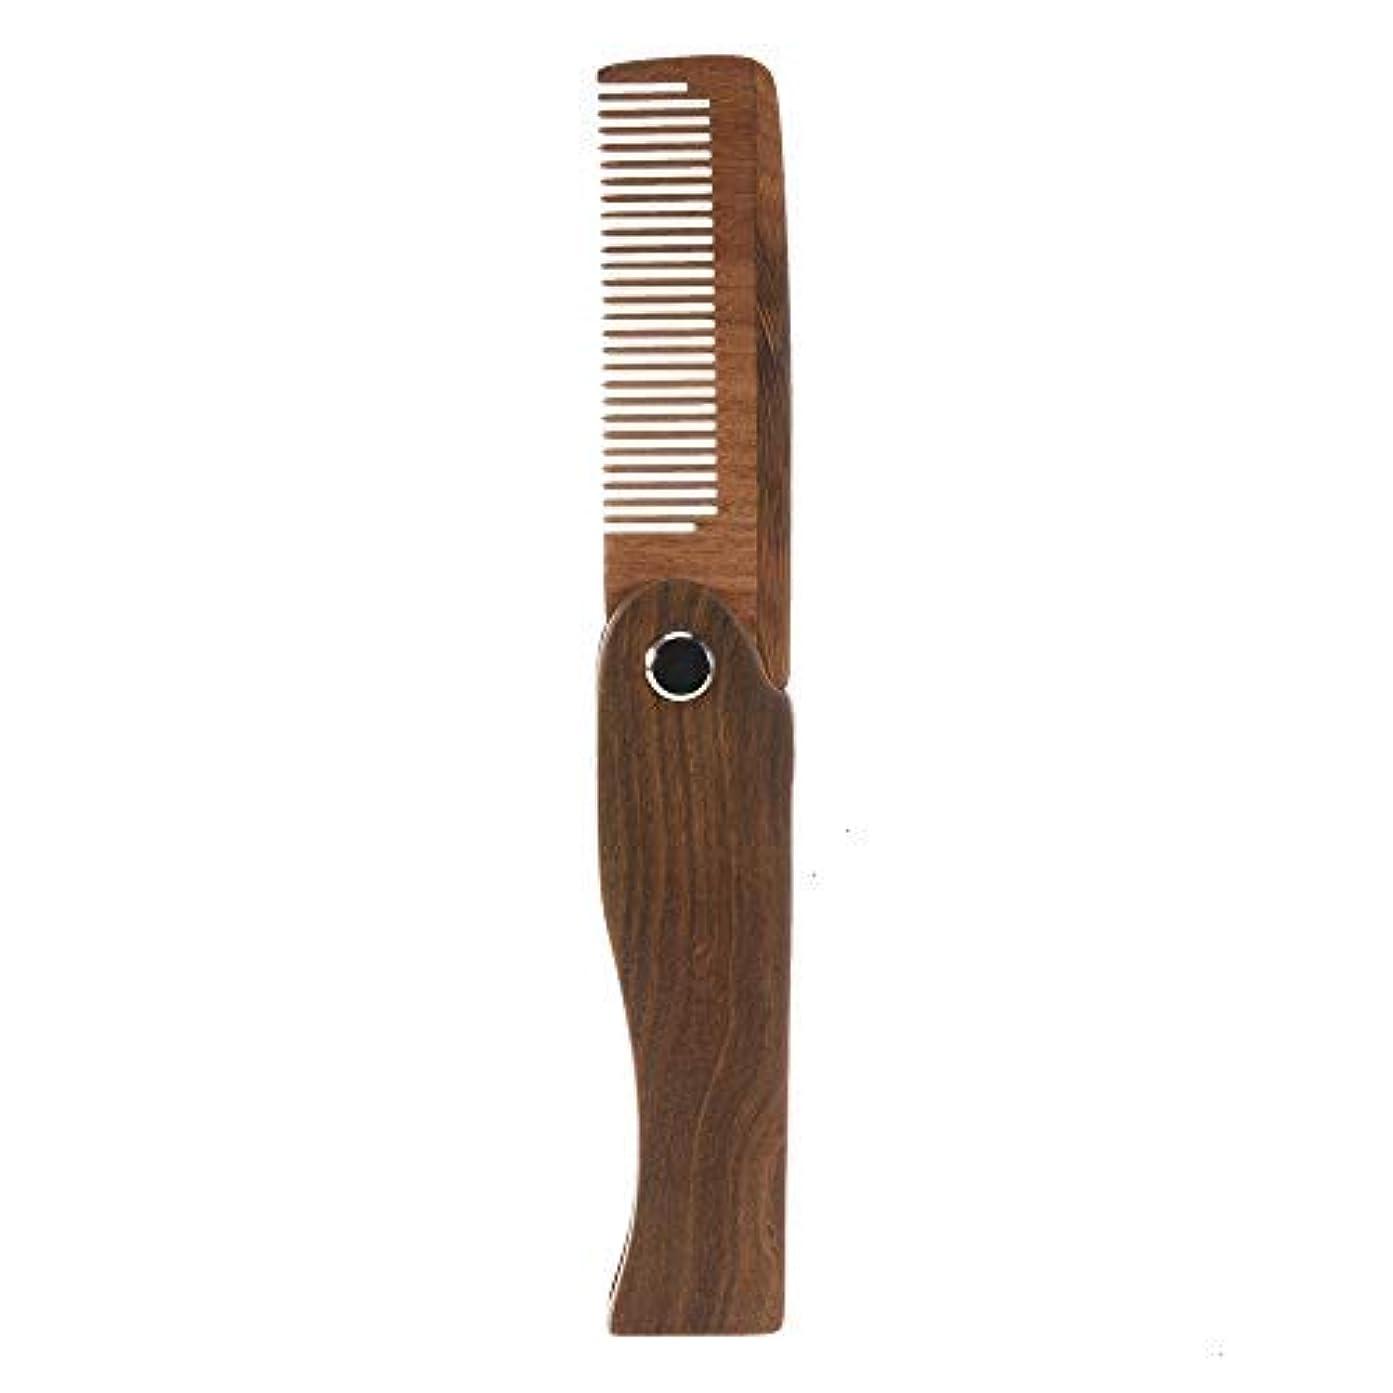 Feeko Folding Wooden Comb, 1 PC Pocket Size Hair Beard Fold Wooden Comb Durable Anti-Static Sandalwood Comb Every...